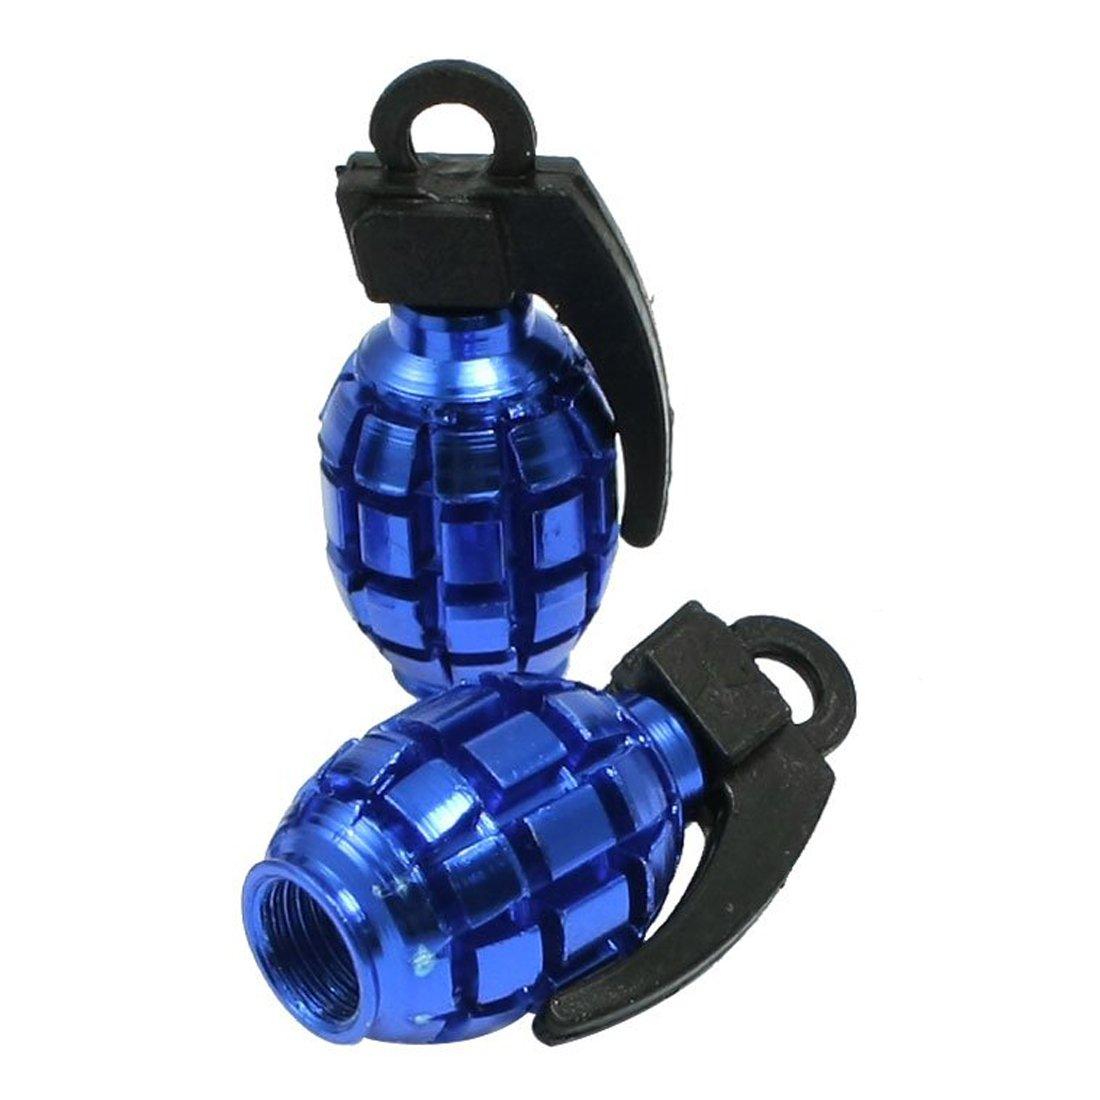 TOOGOO(R) 4 Pcs Car Alloy Grenade Shaped Tire Valve Cap Cover Blue